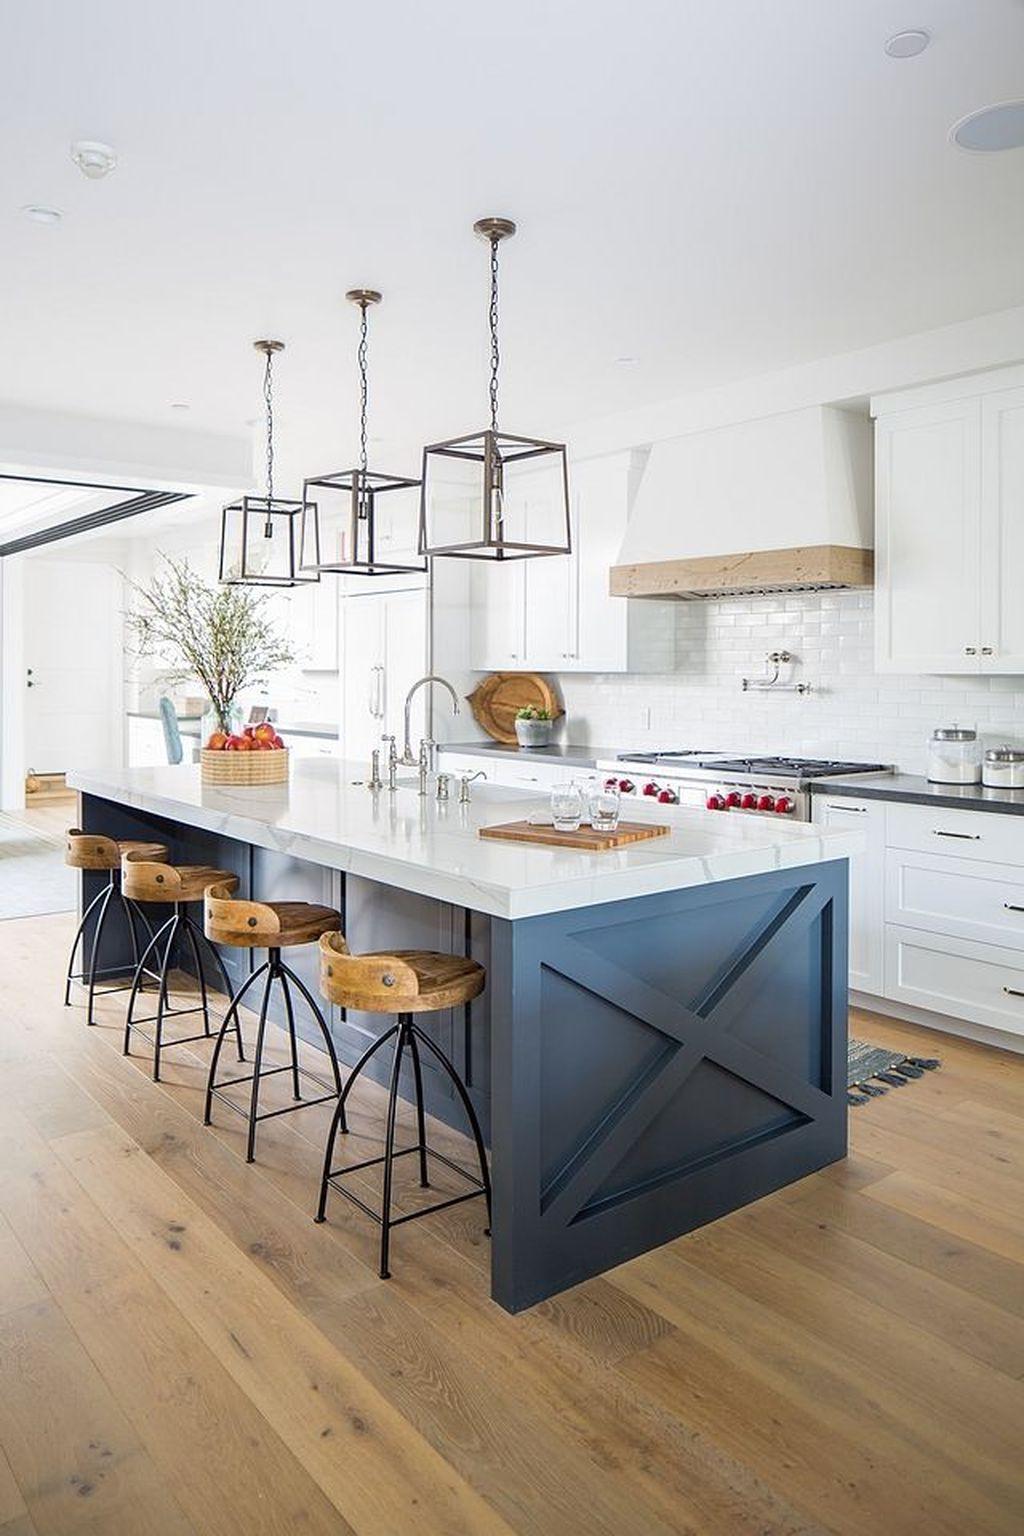 Stunning Farmhouse Kitchen Cabinets Design Ideas Which You Definitely Like #farmhousekitchencountertops